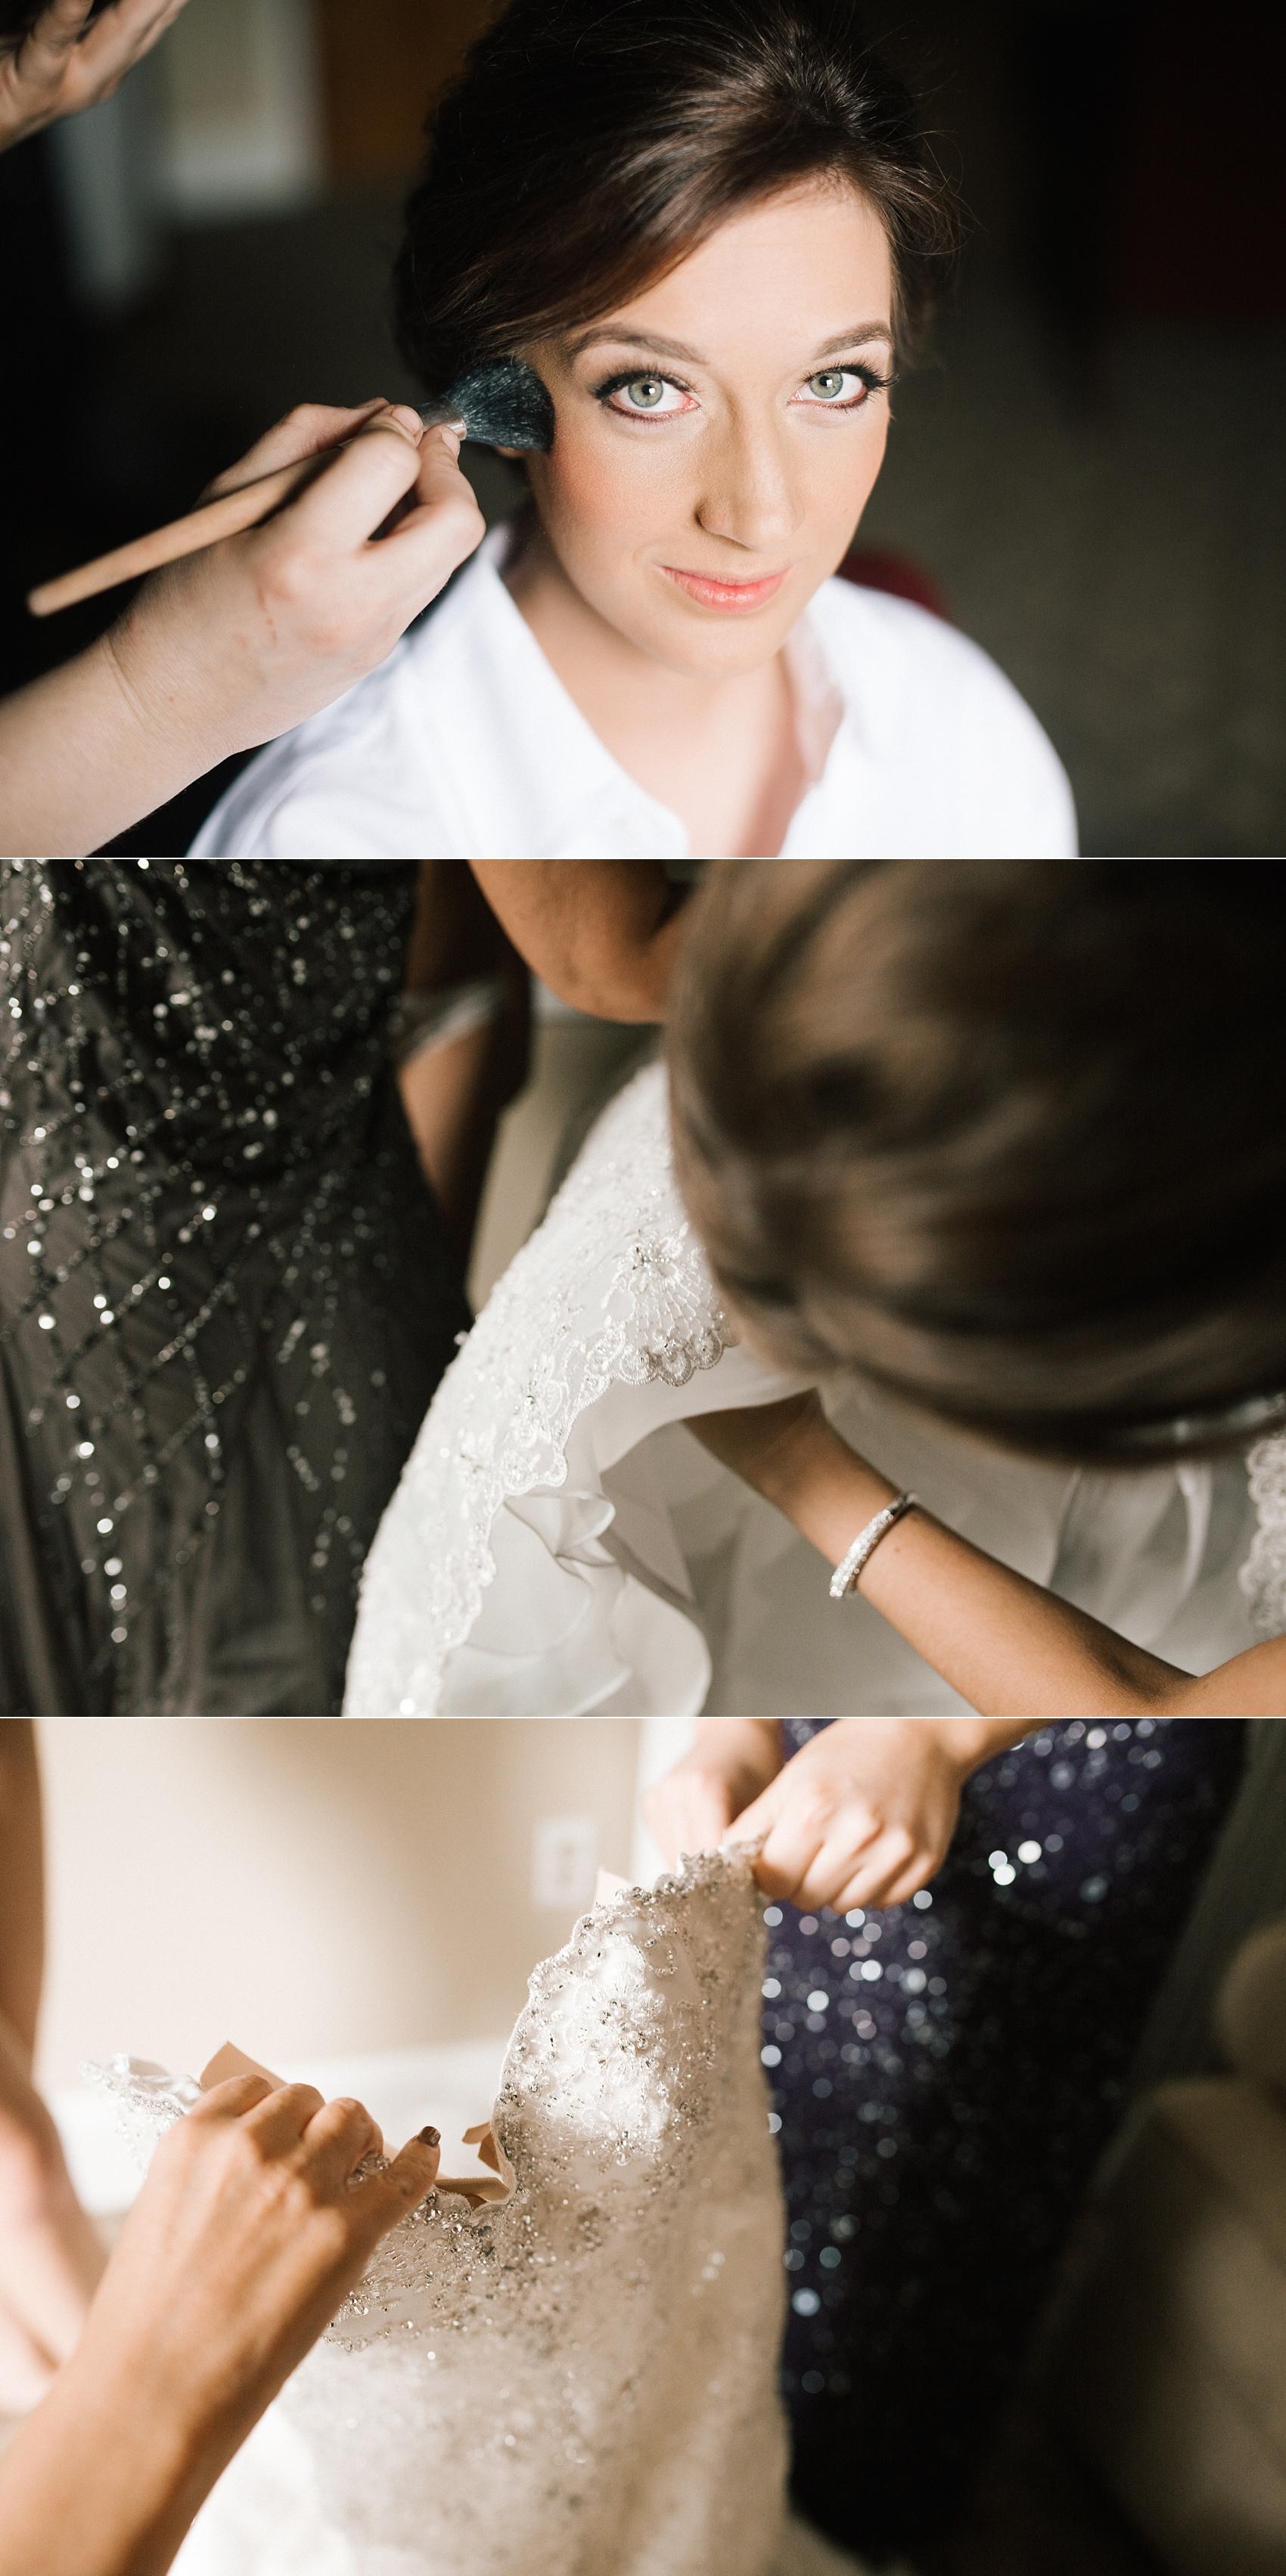 dwayne lydia delaware wedding philadelphia baltimore washingtion dc wedding photographer-6